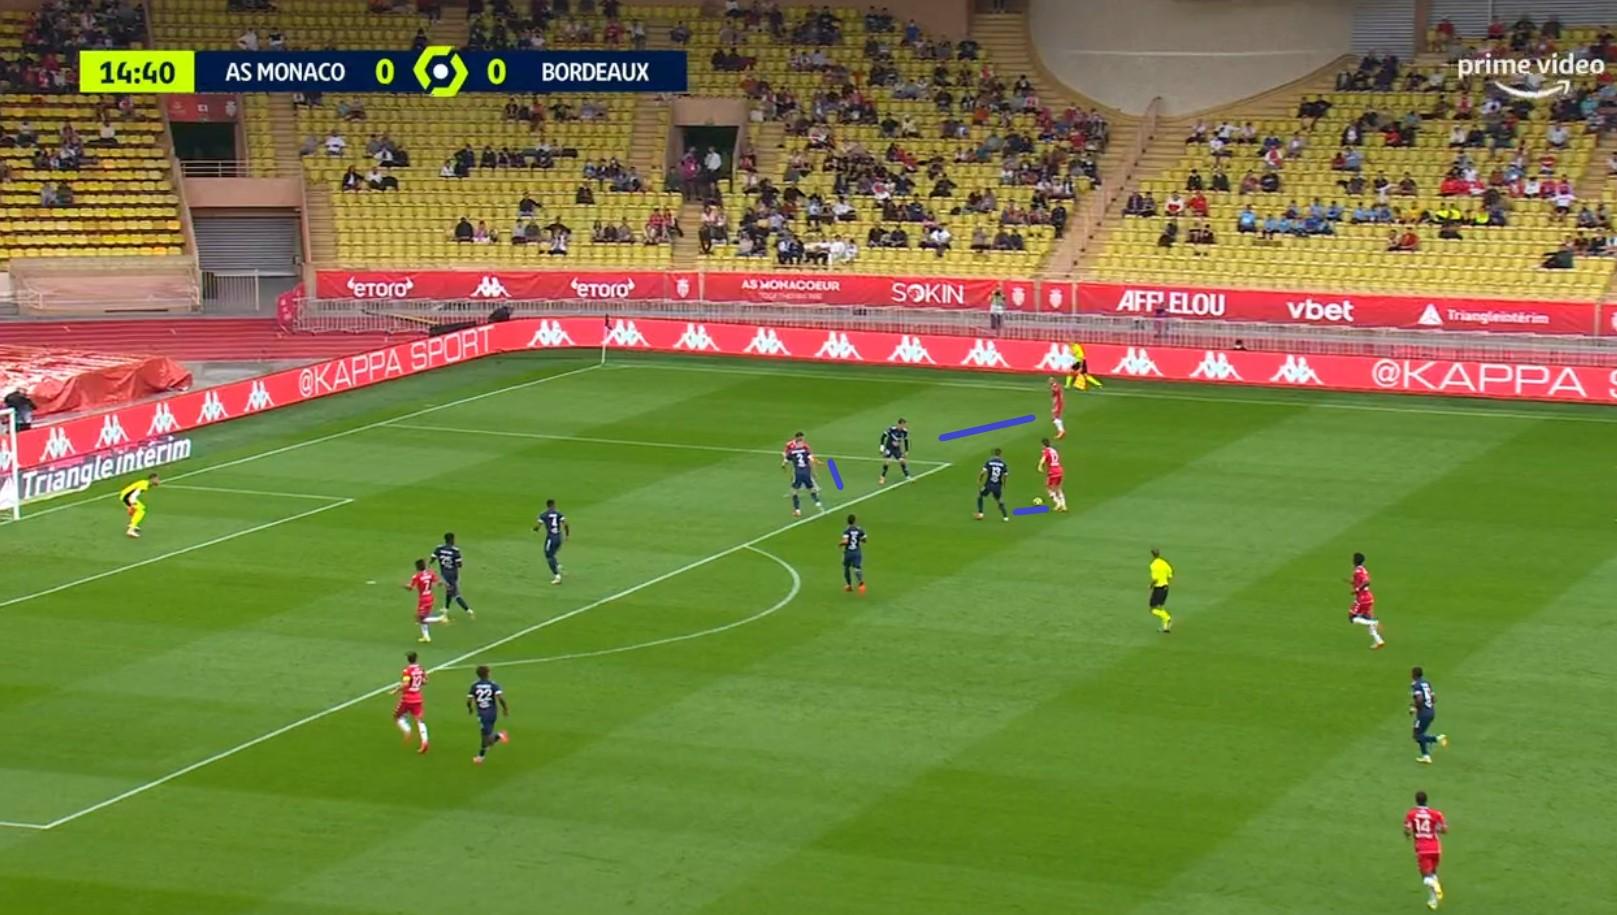 Monaco1_5.jpg (304 KB)